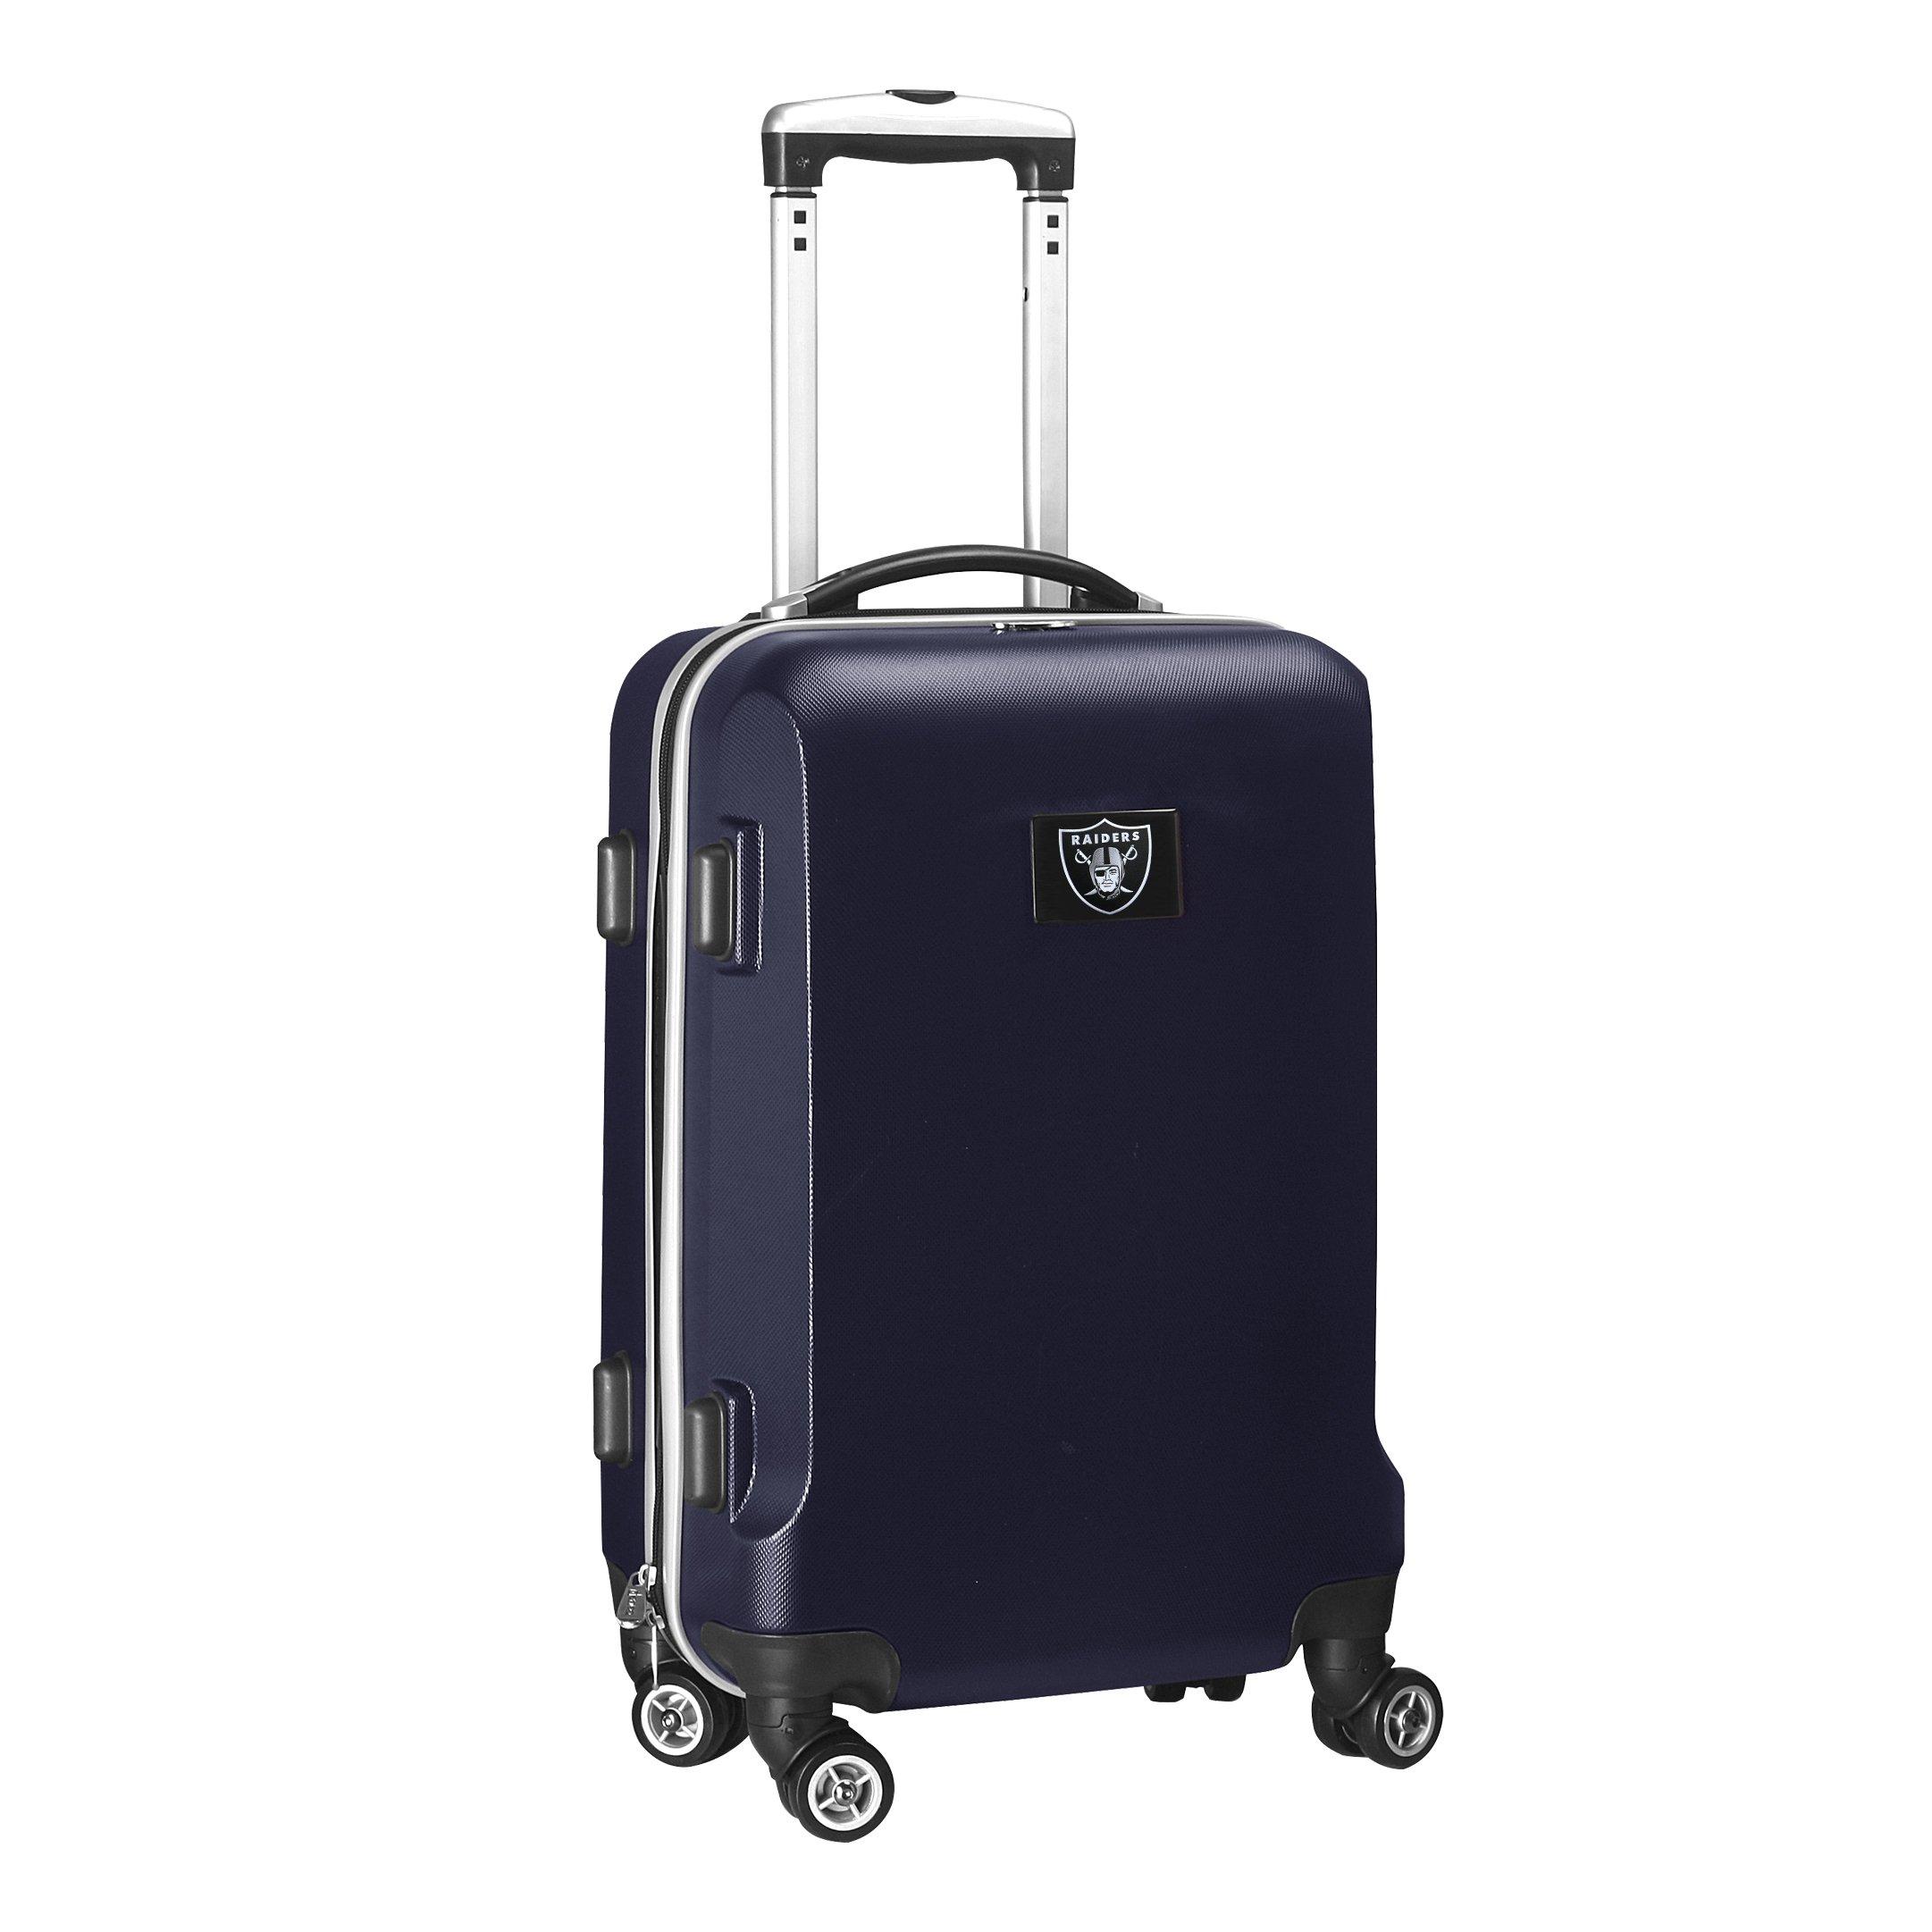 Denco NFL Oakland Raiders Carry-On Hardcase Luggage Spinner, Navy by Denco (Image #2)